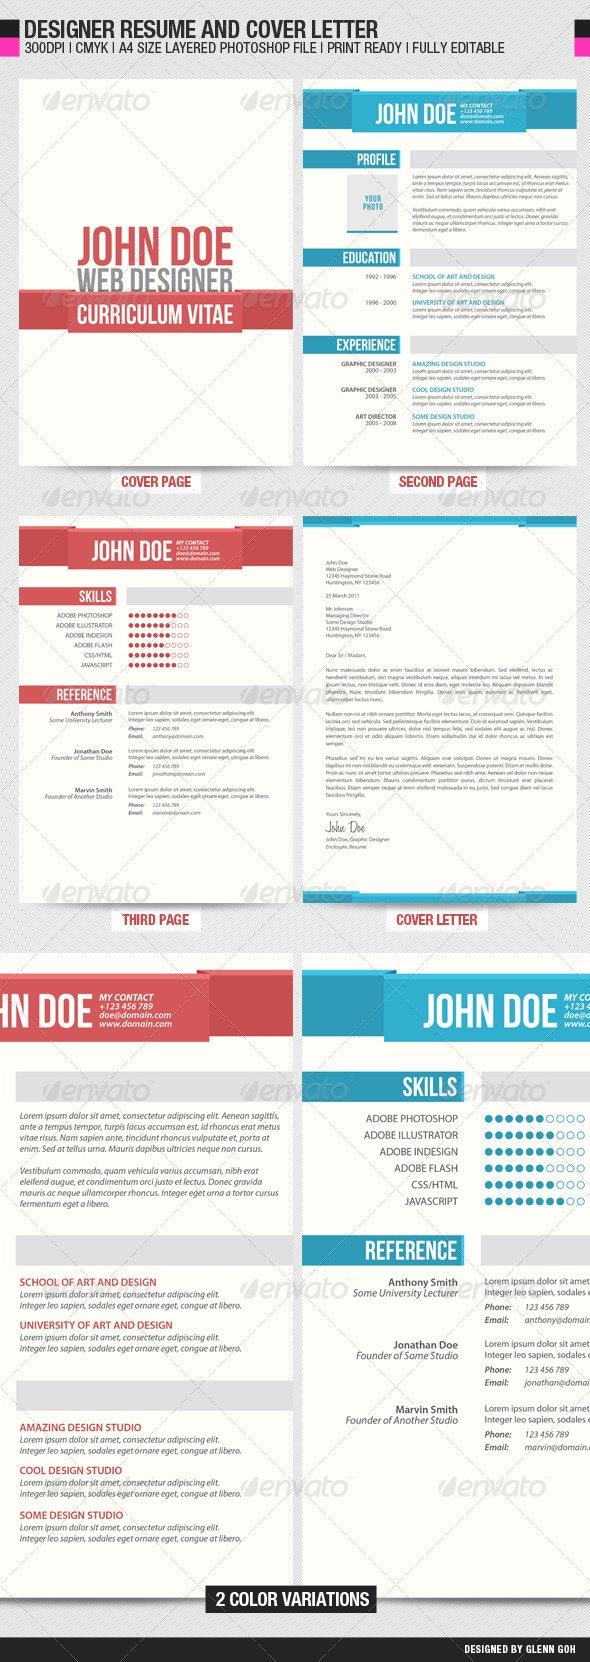 Designer Resume and Cover Letter - Resumes Stationery